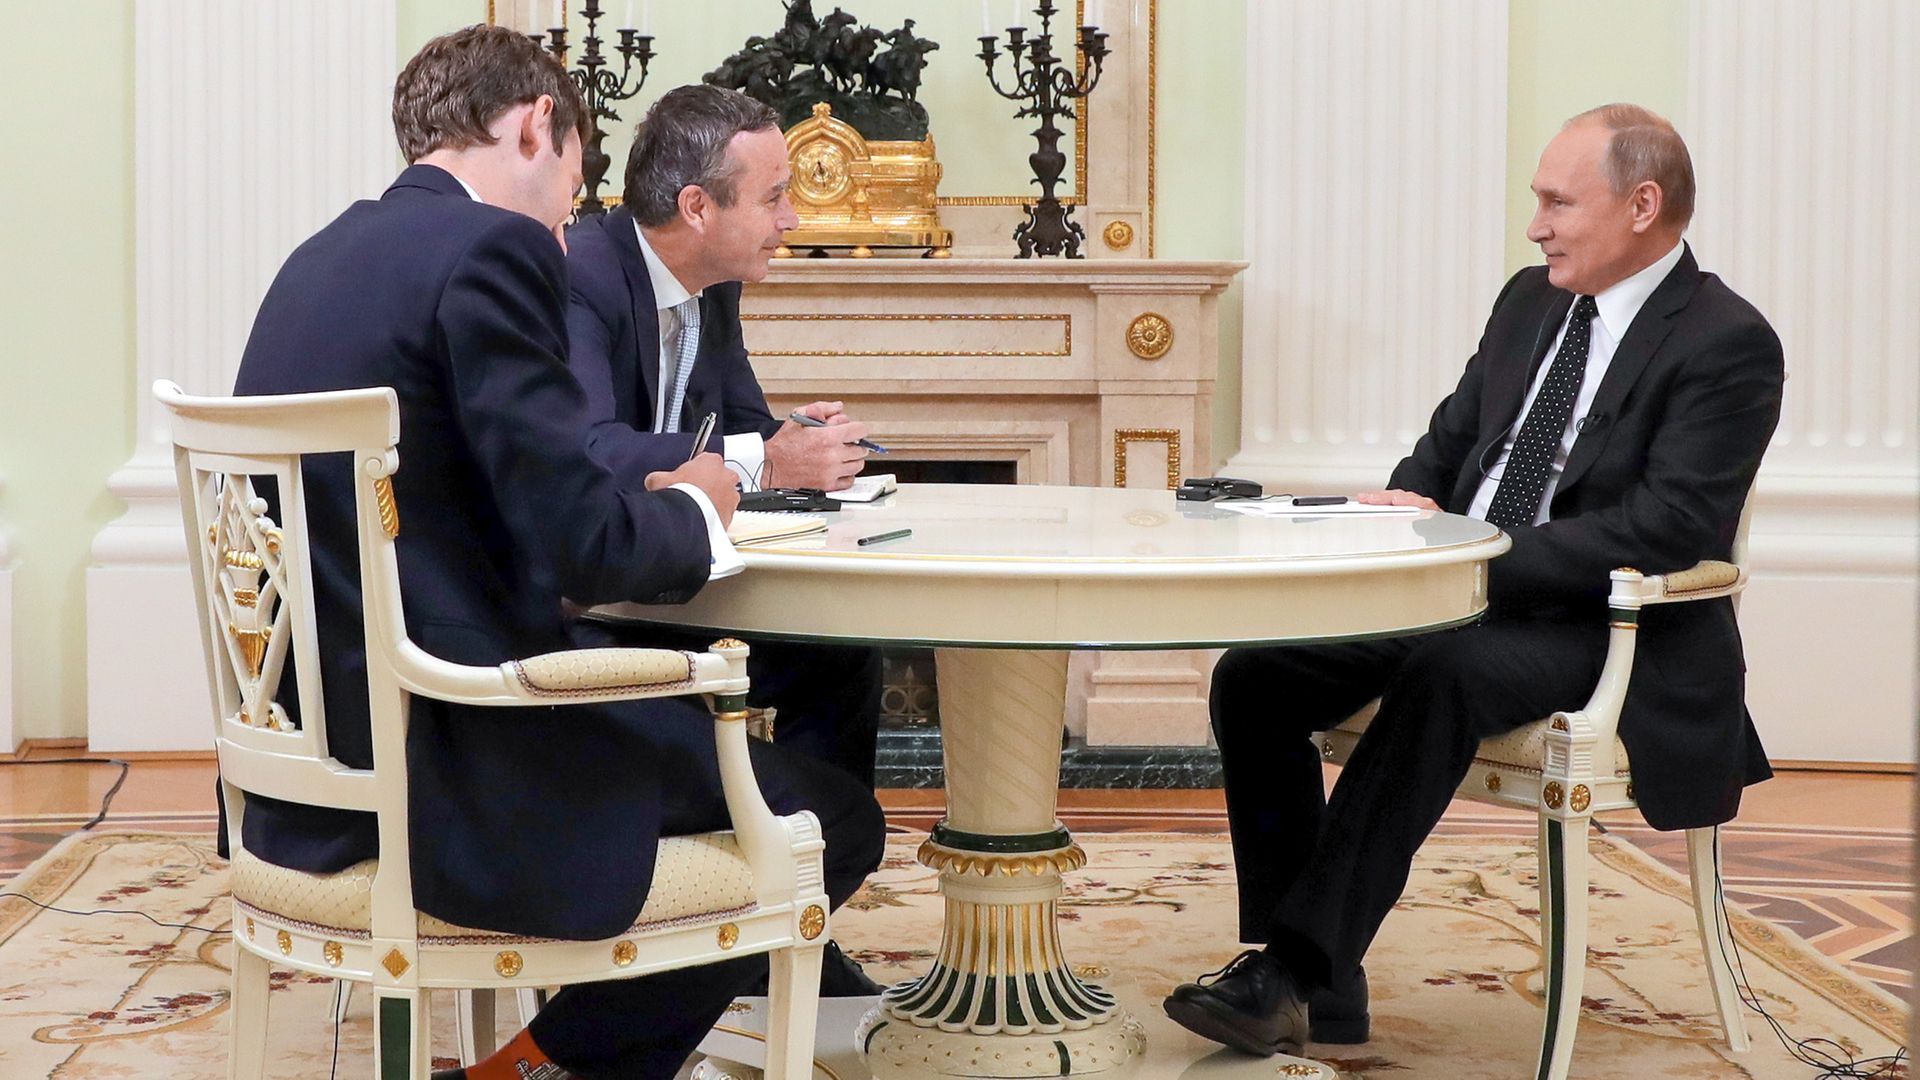 Lionel Barber, centre, and Henry Foy, left, interview Vladimir Putin in Moscow in June 2019 - Credit: Mikhail Klimentyev/TASS